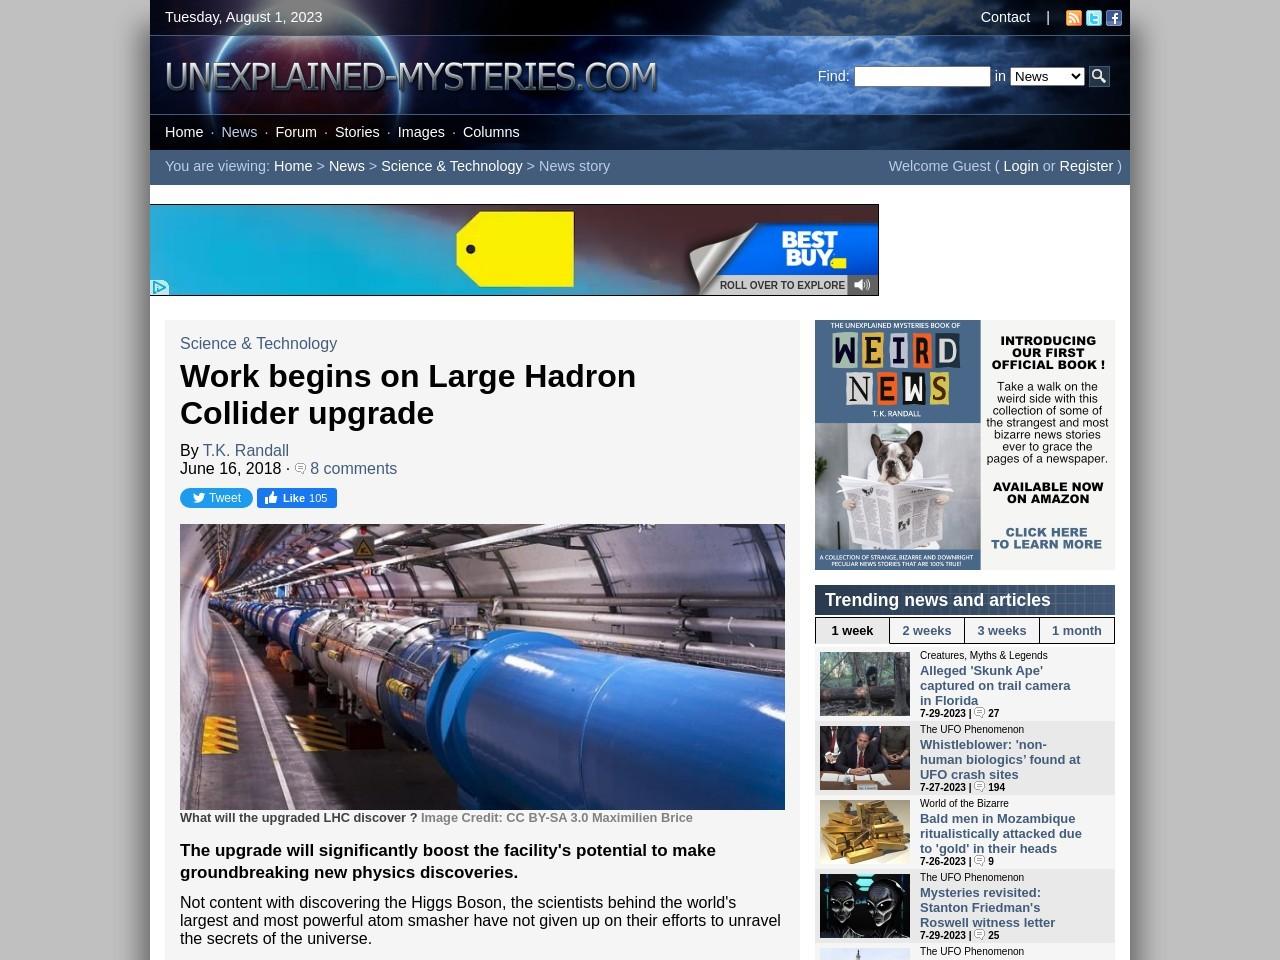 Work begins on Large Hadron Collider upgrade